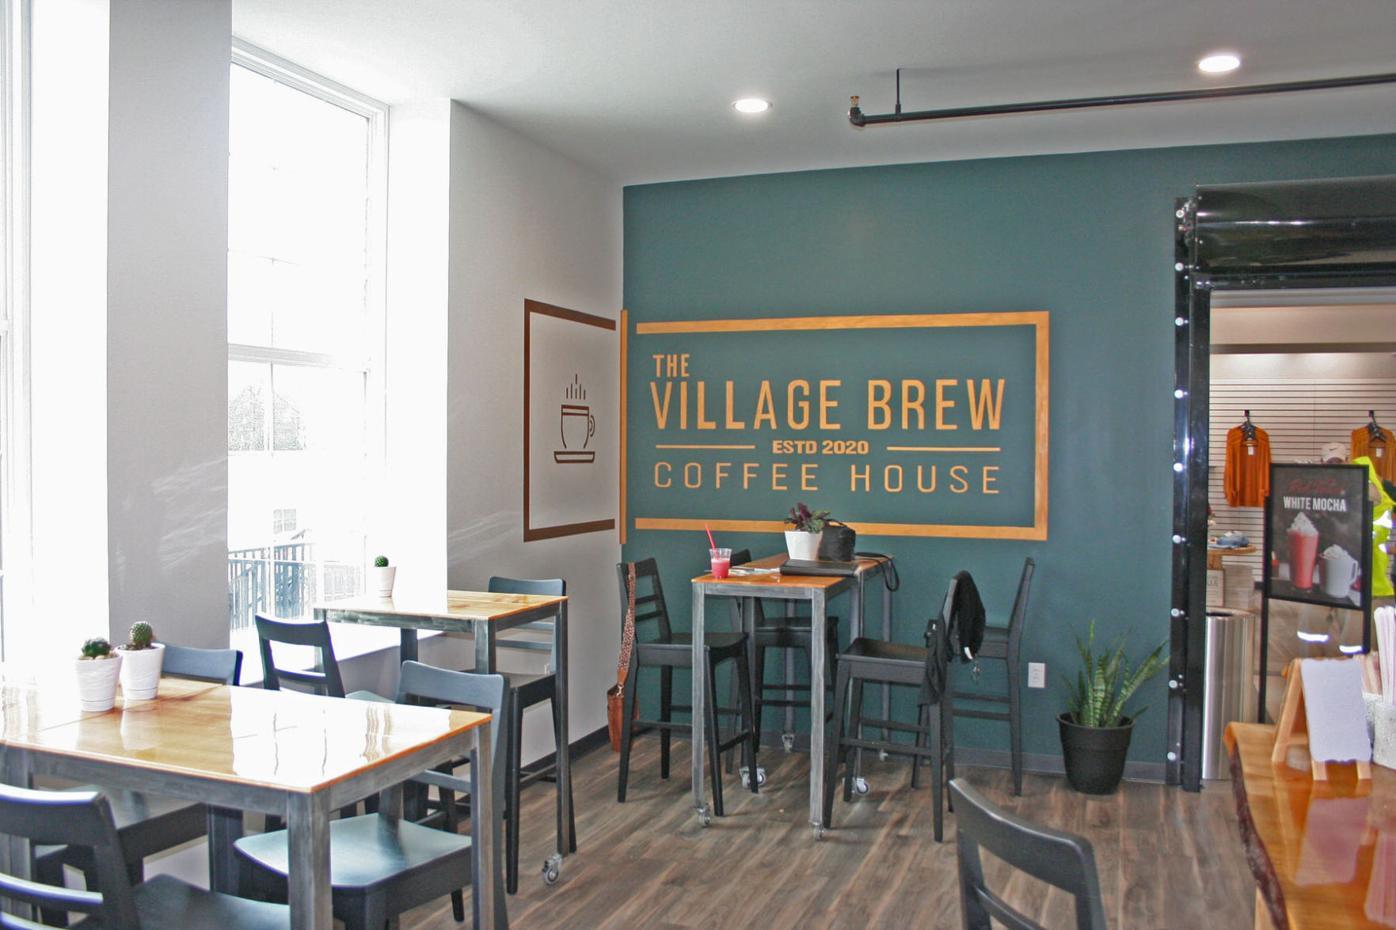 Village Brew - logo on wall